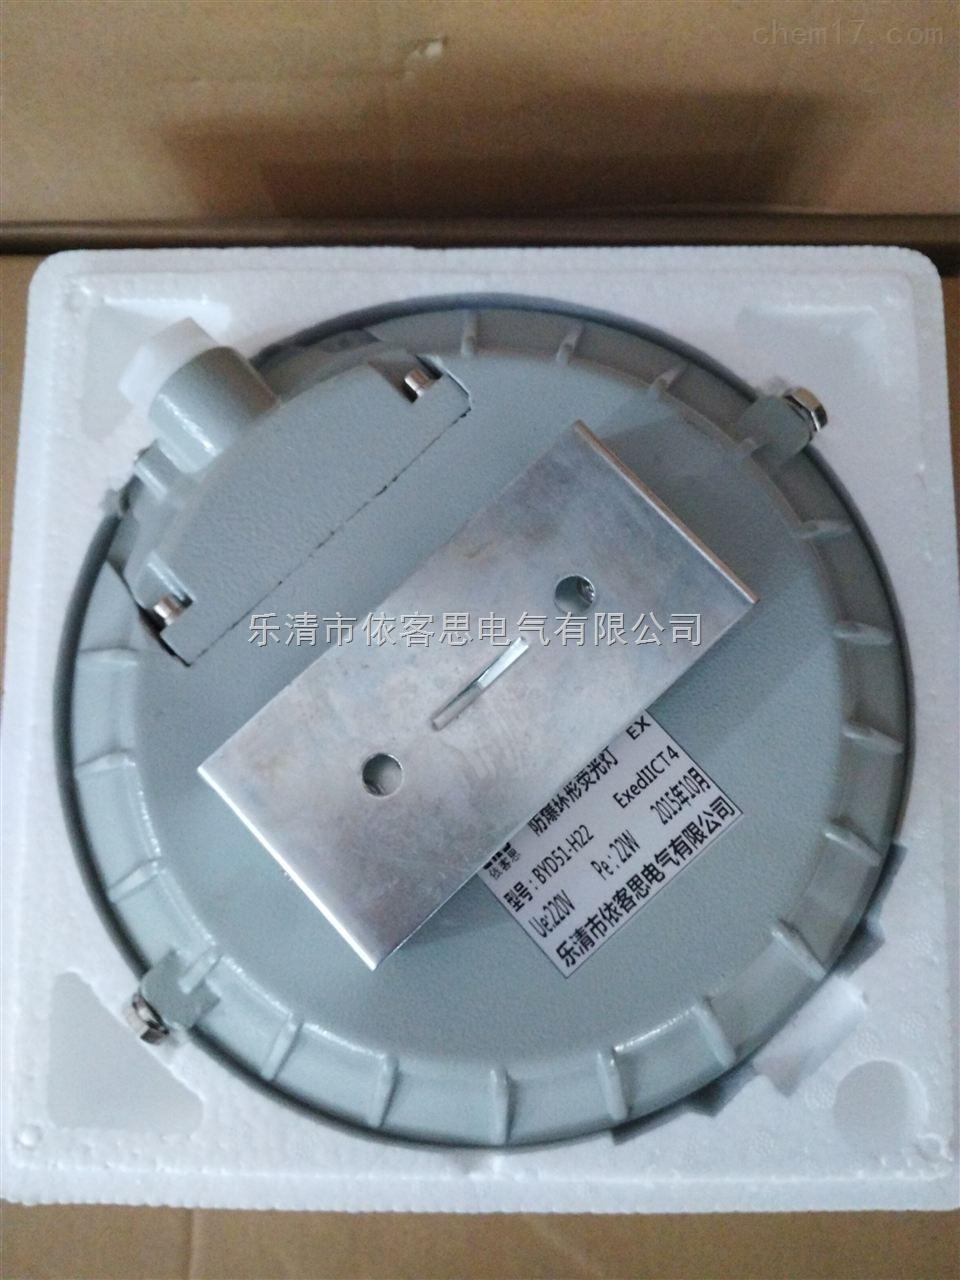 BYD51-22W/220V防爆环形荧光灯 价格 批发